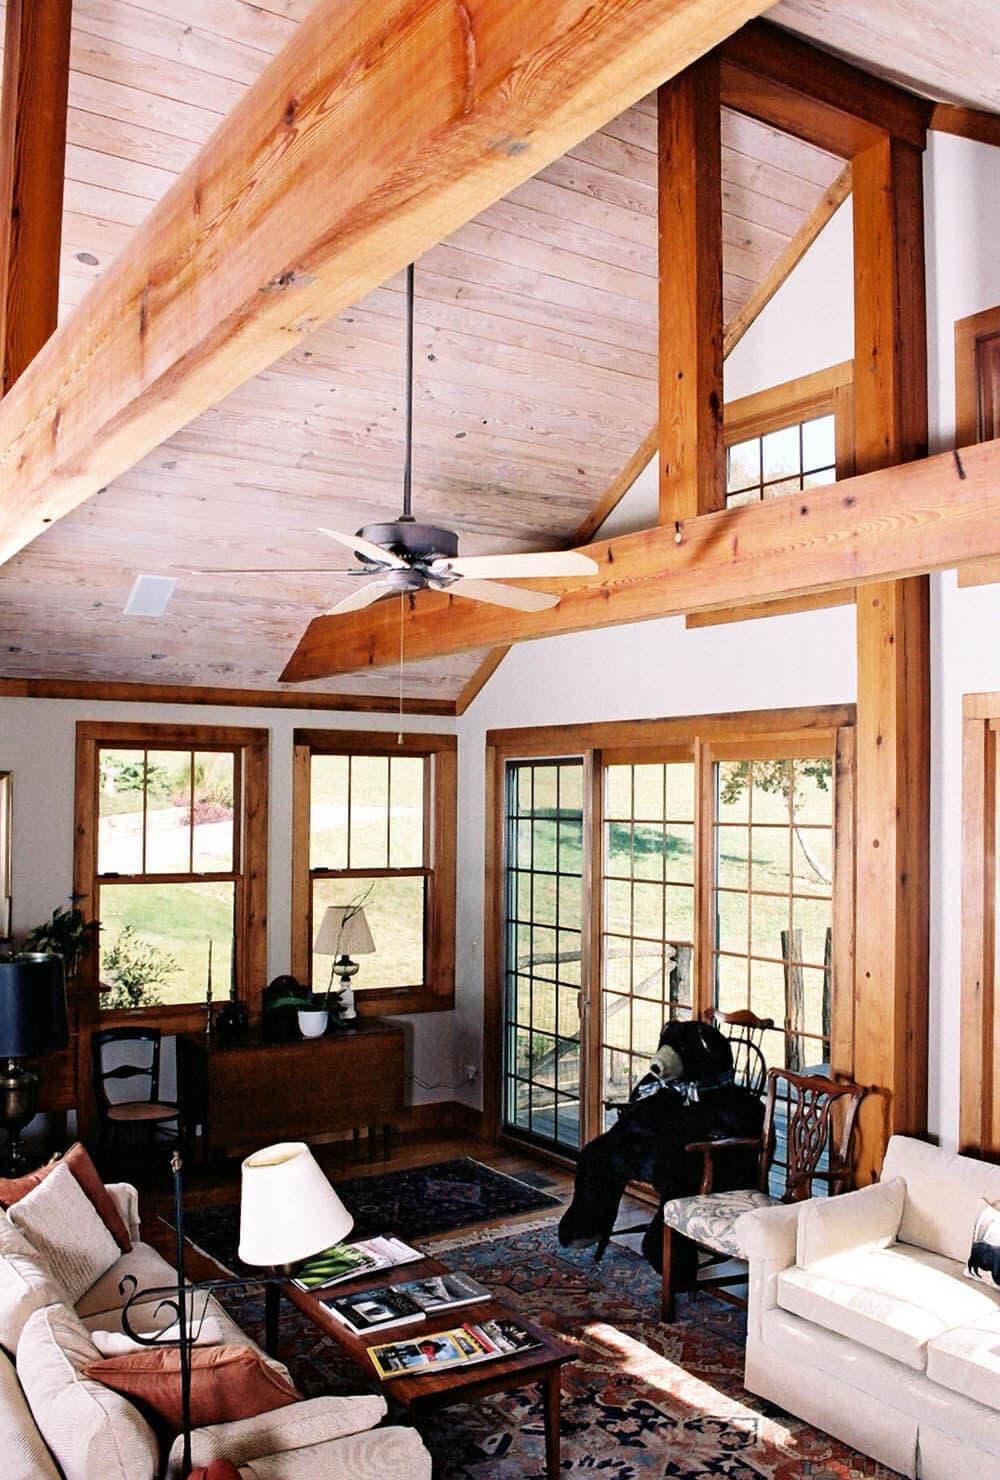 Heart pine beams in Travelers Rest, SC